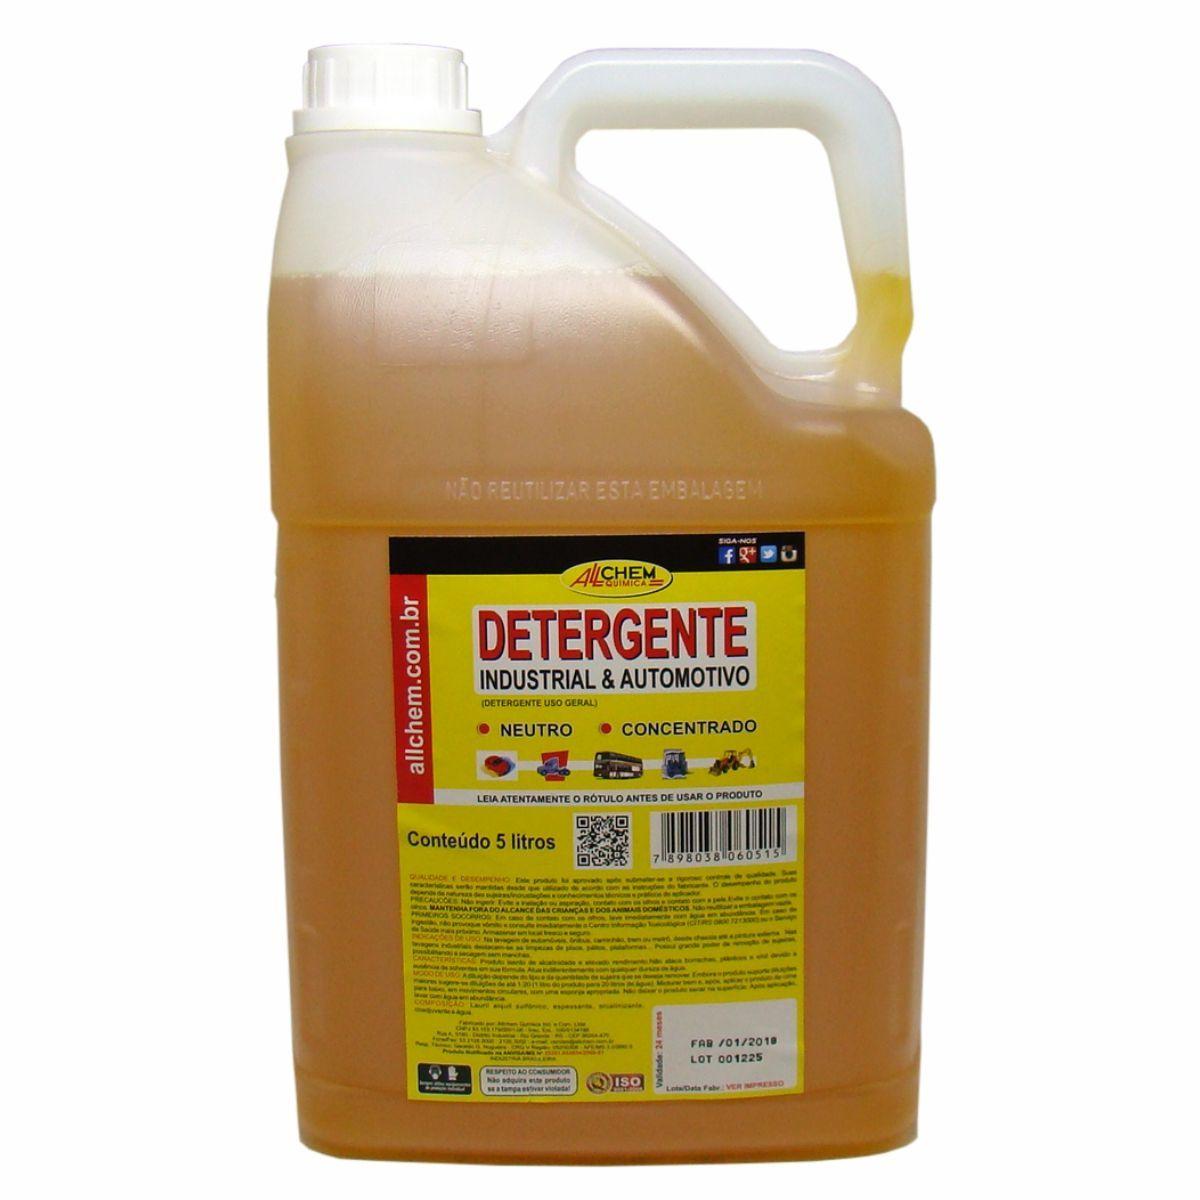 Detergente Automotivo e Industrial 2x5 Litros